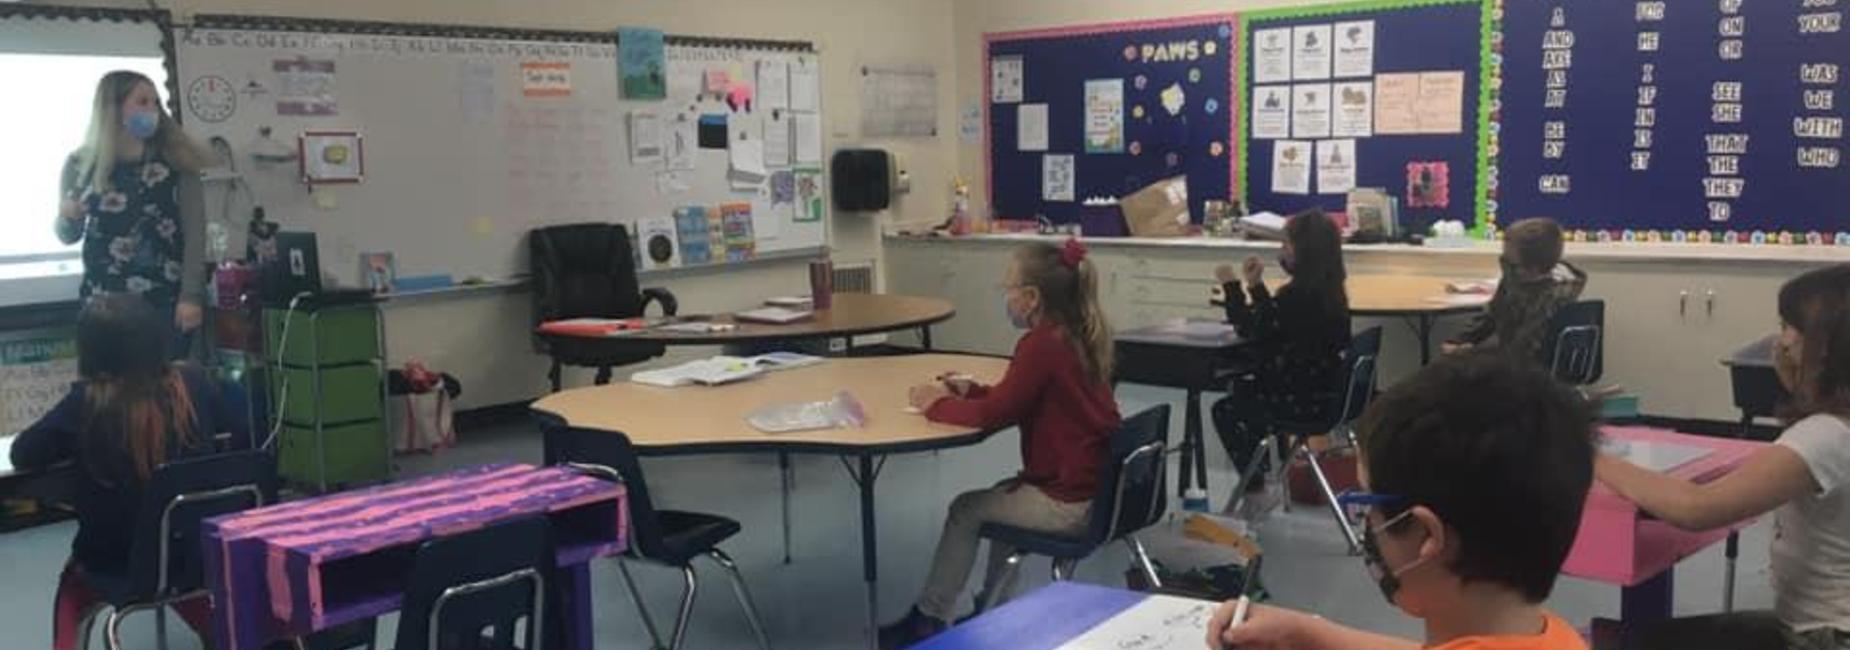 students do classwork